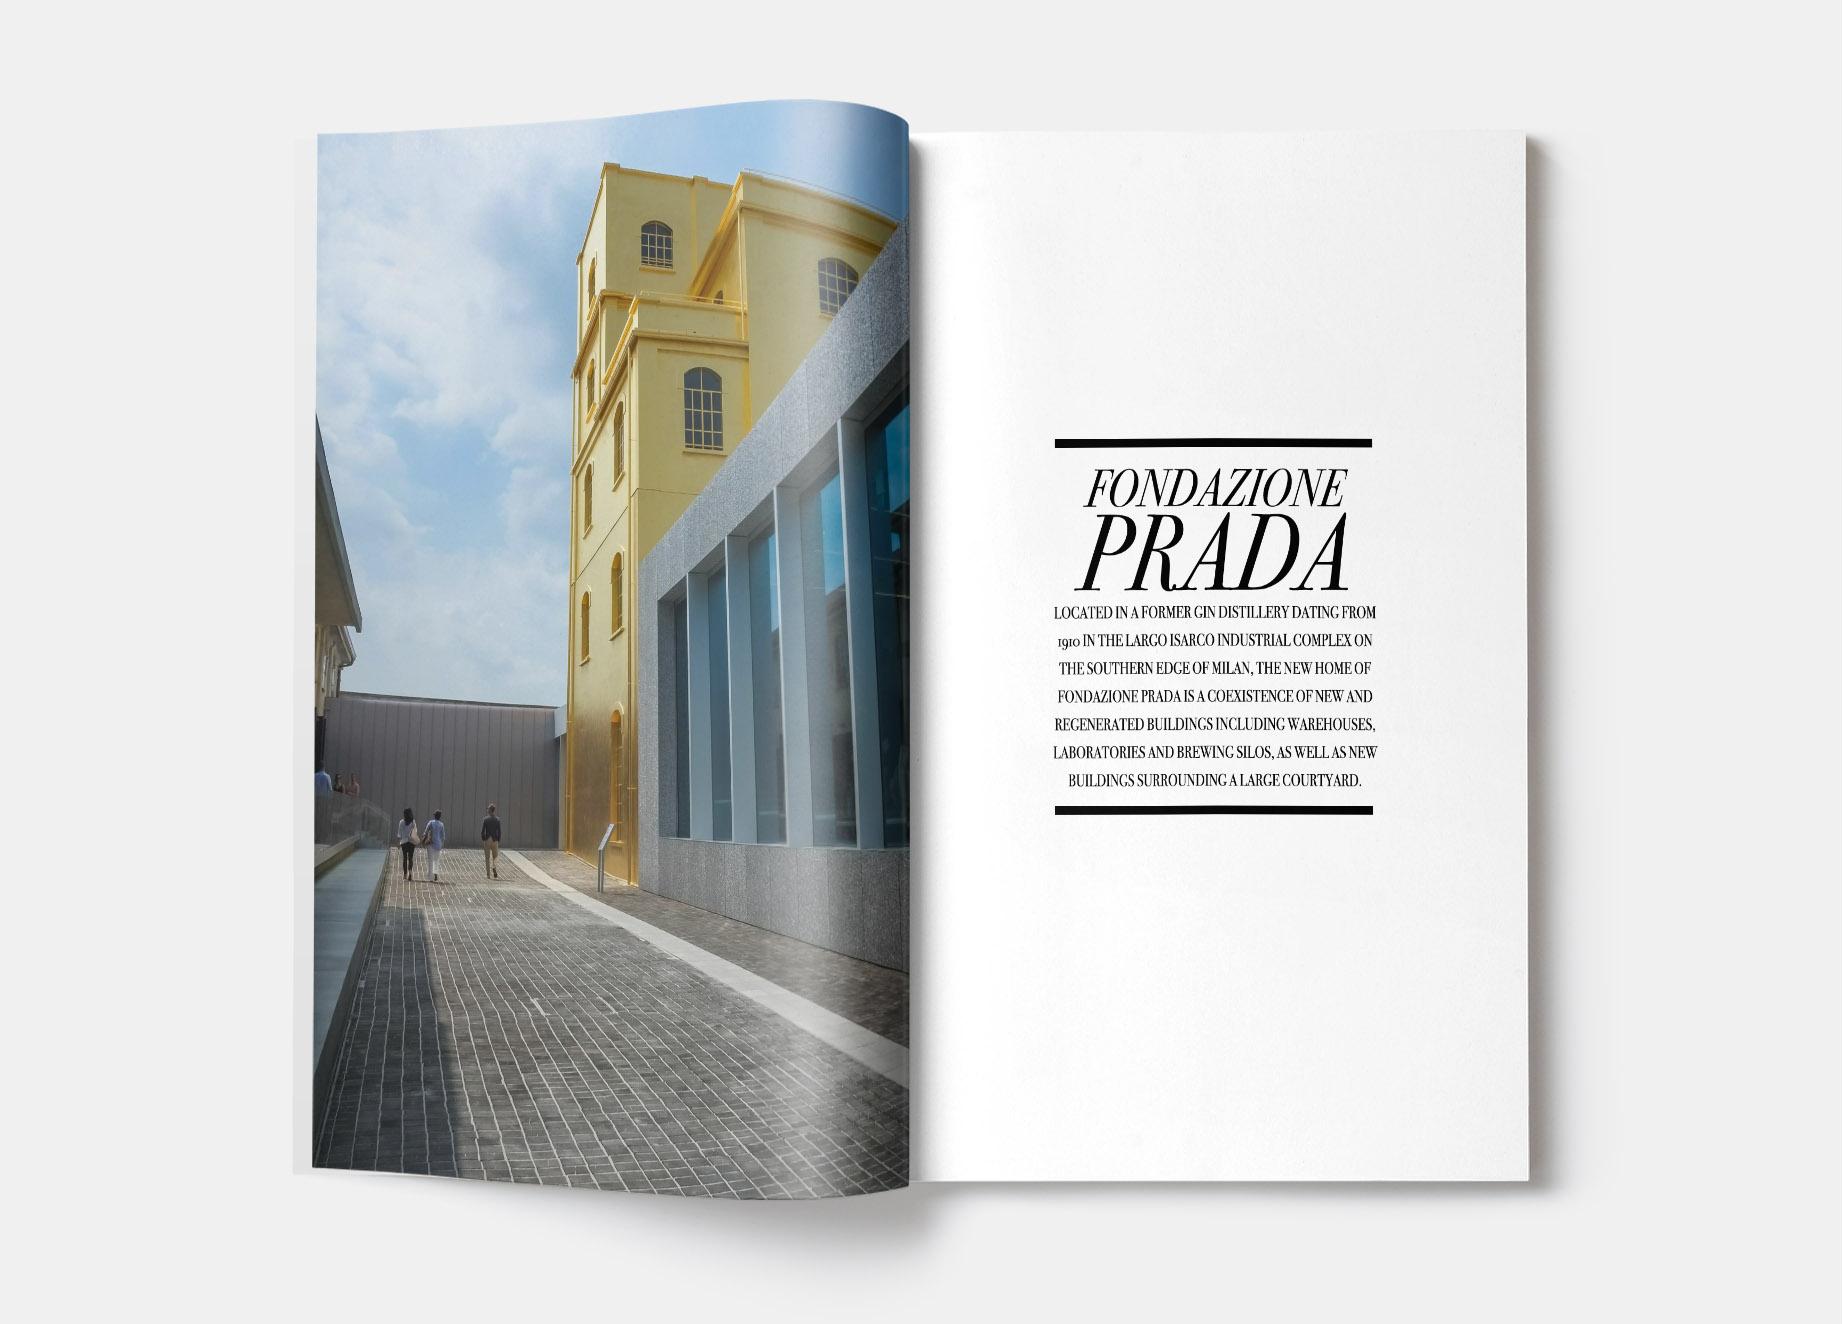 Fondation Prada Milan - Photos Laurent scavone. Editorial, magasine international